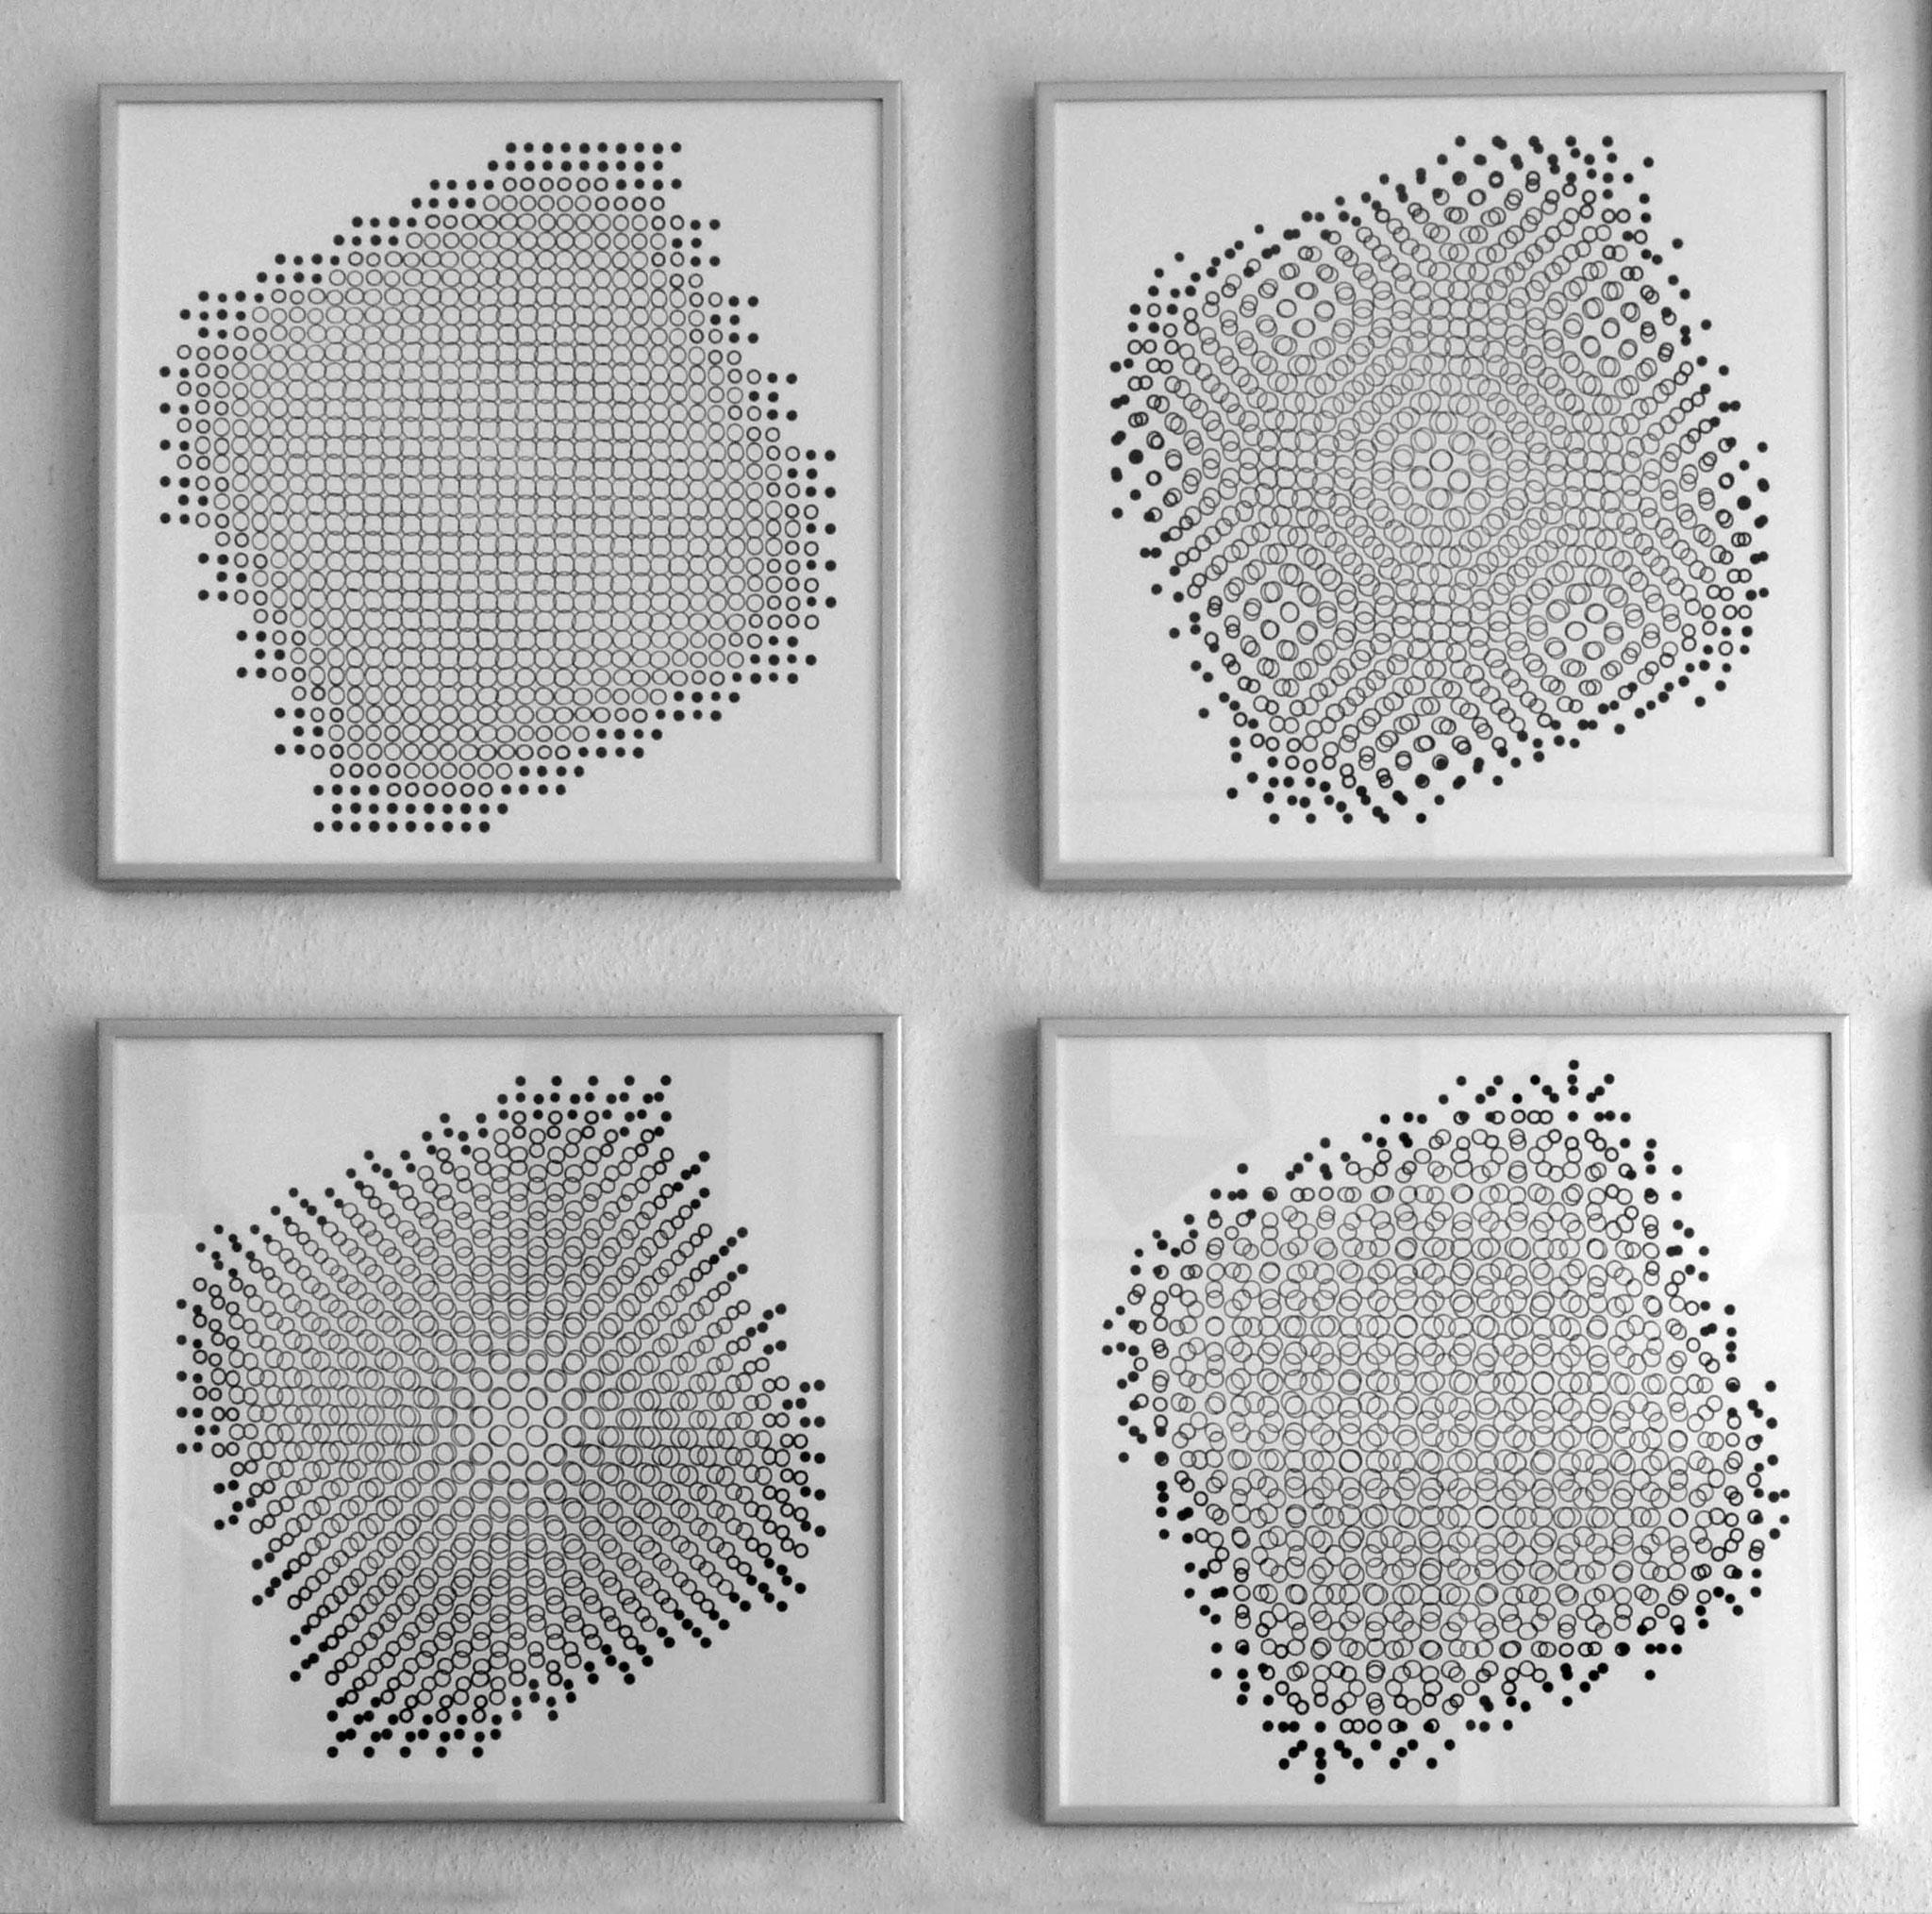 Vier Lochblendenstrukturen, 1967. Serie 3.8.14 D